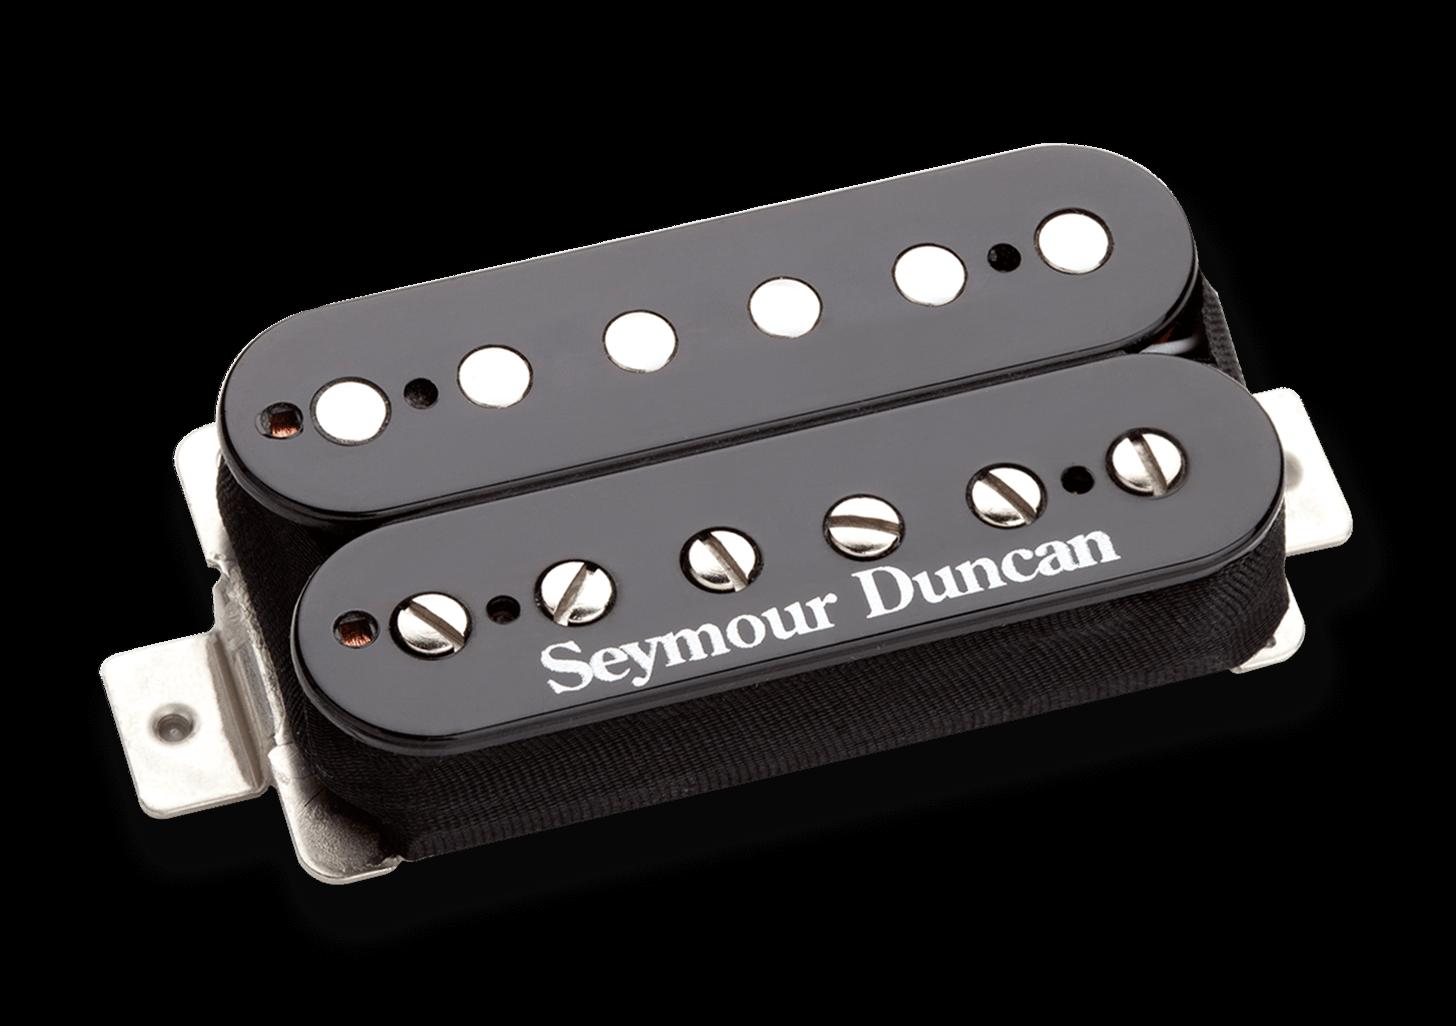 Neu Seymour Duncan Sh-6b Verzerrung 4-conductor Humbucker Steg-Pickup Schwarz